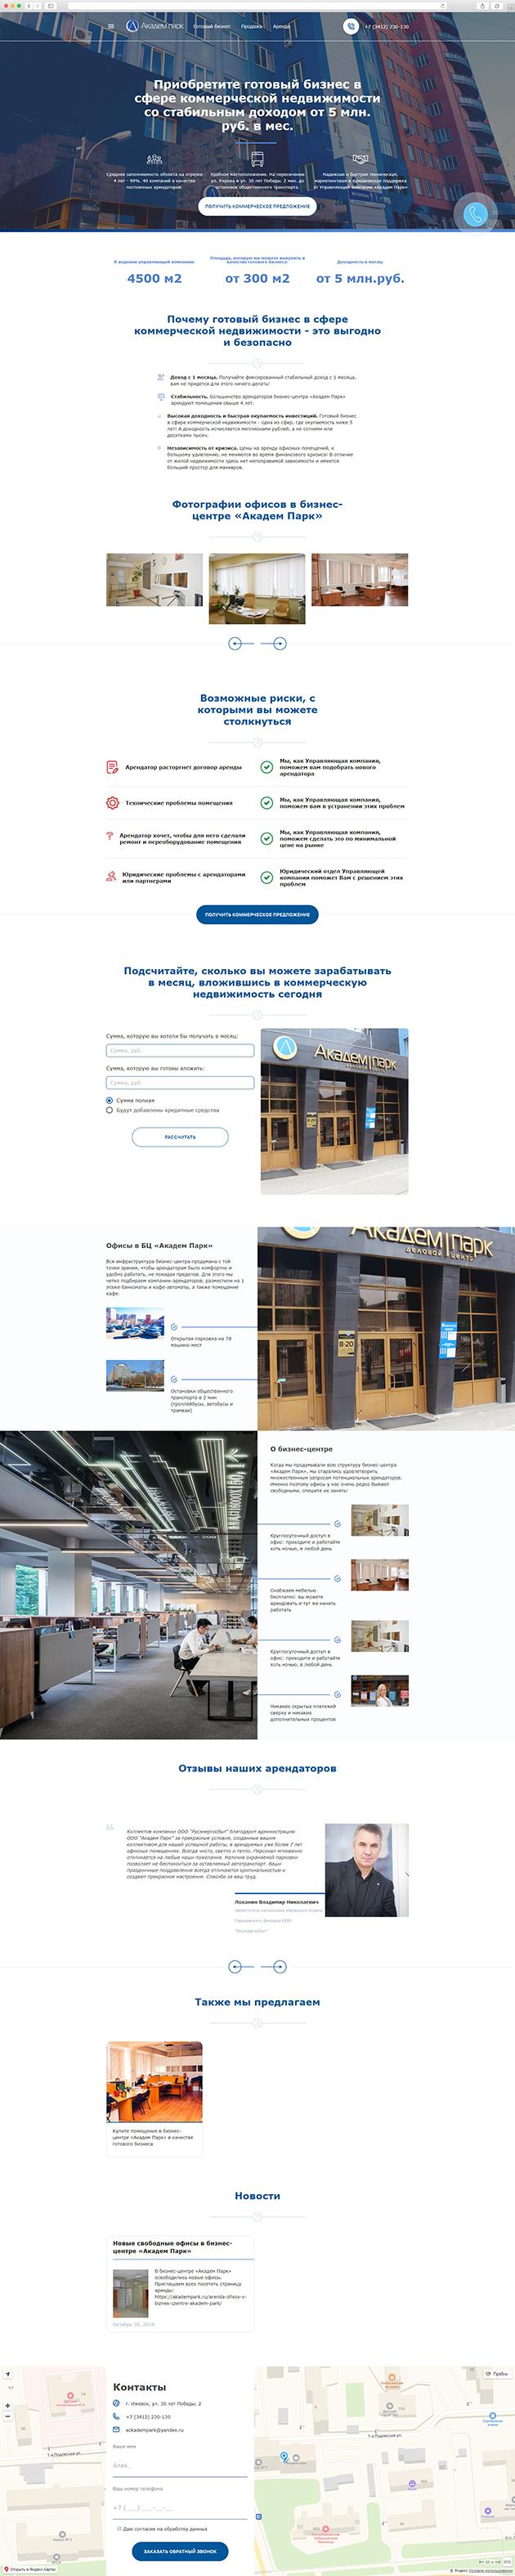 сайт академ парка готовый бизнес